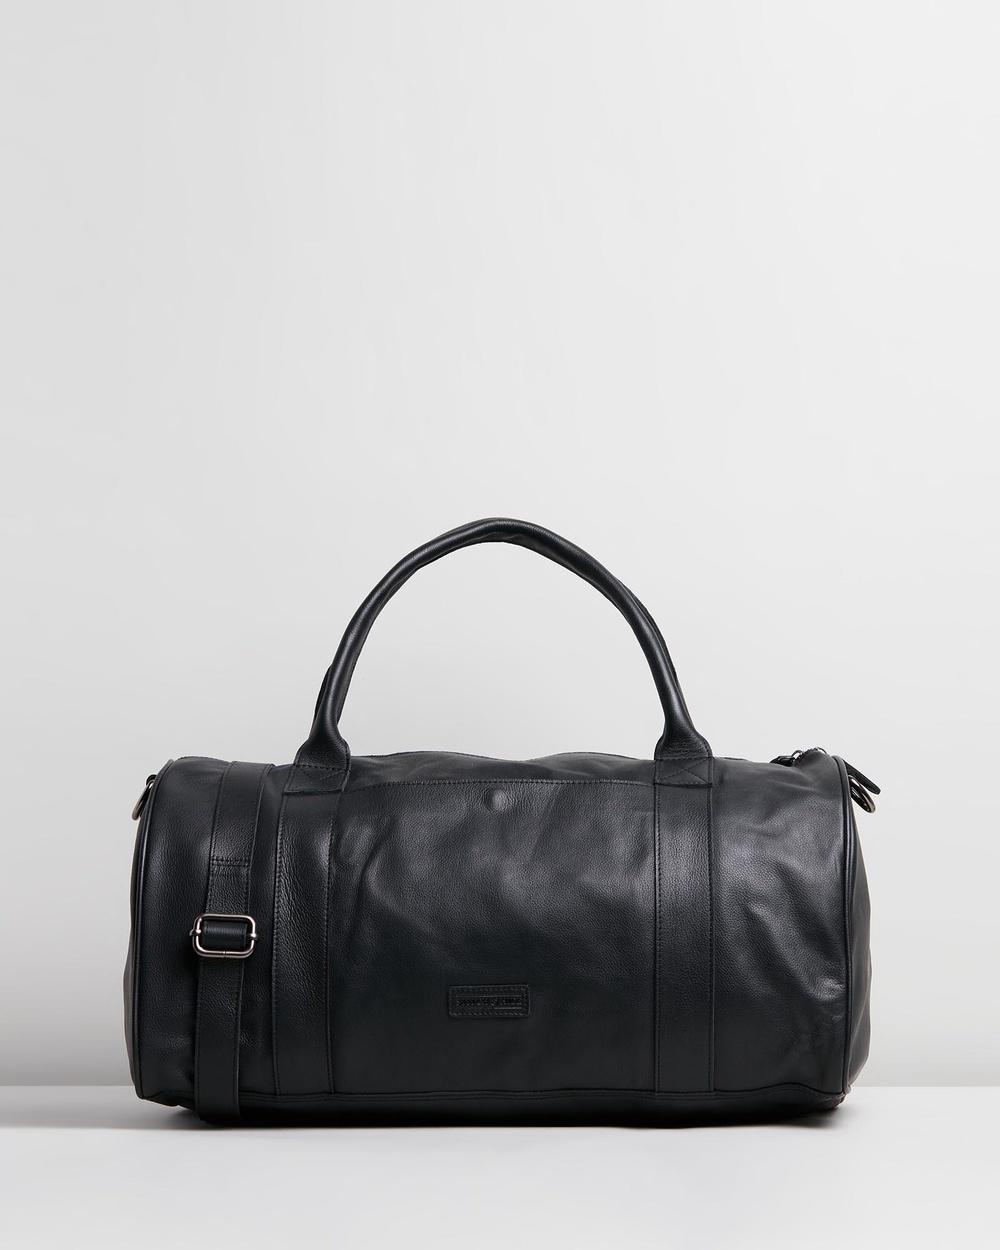 Stitch & Hide Globe Weekender Duffle Bags Black